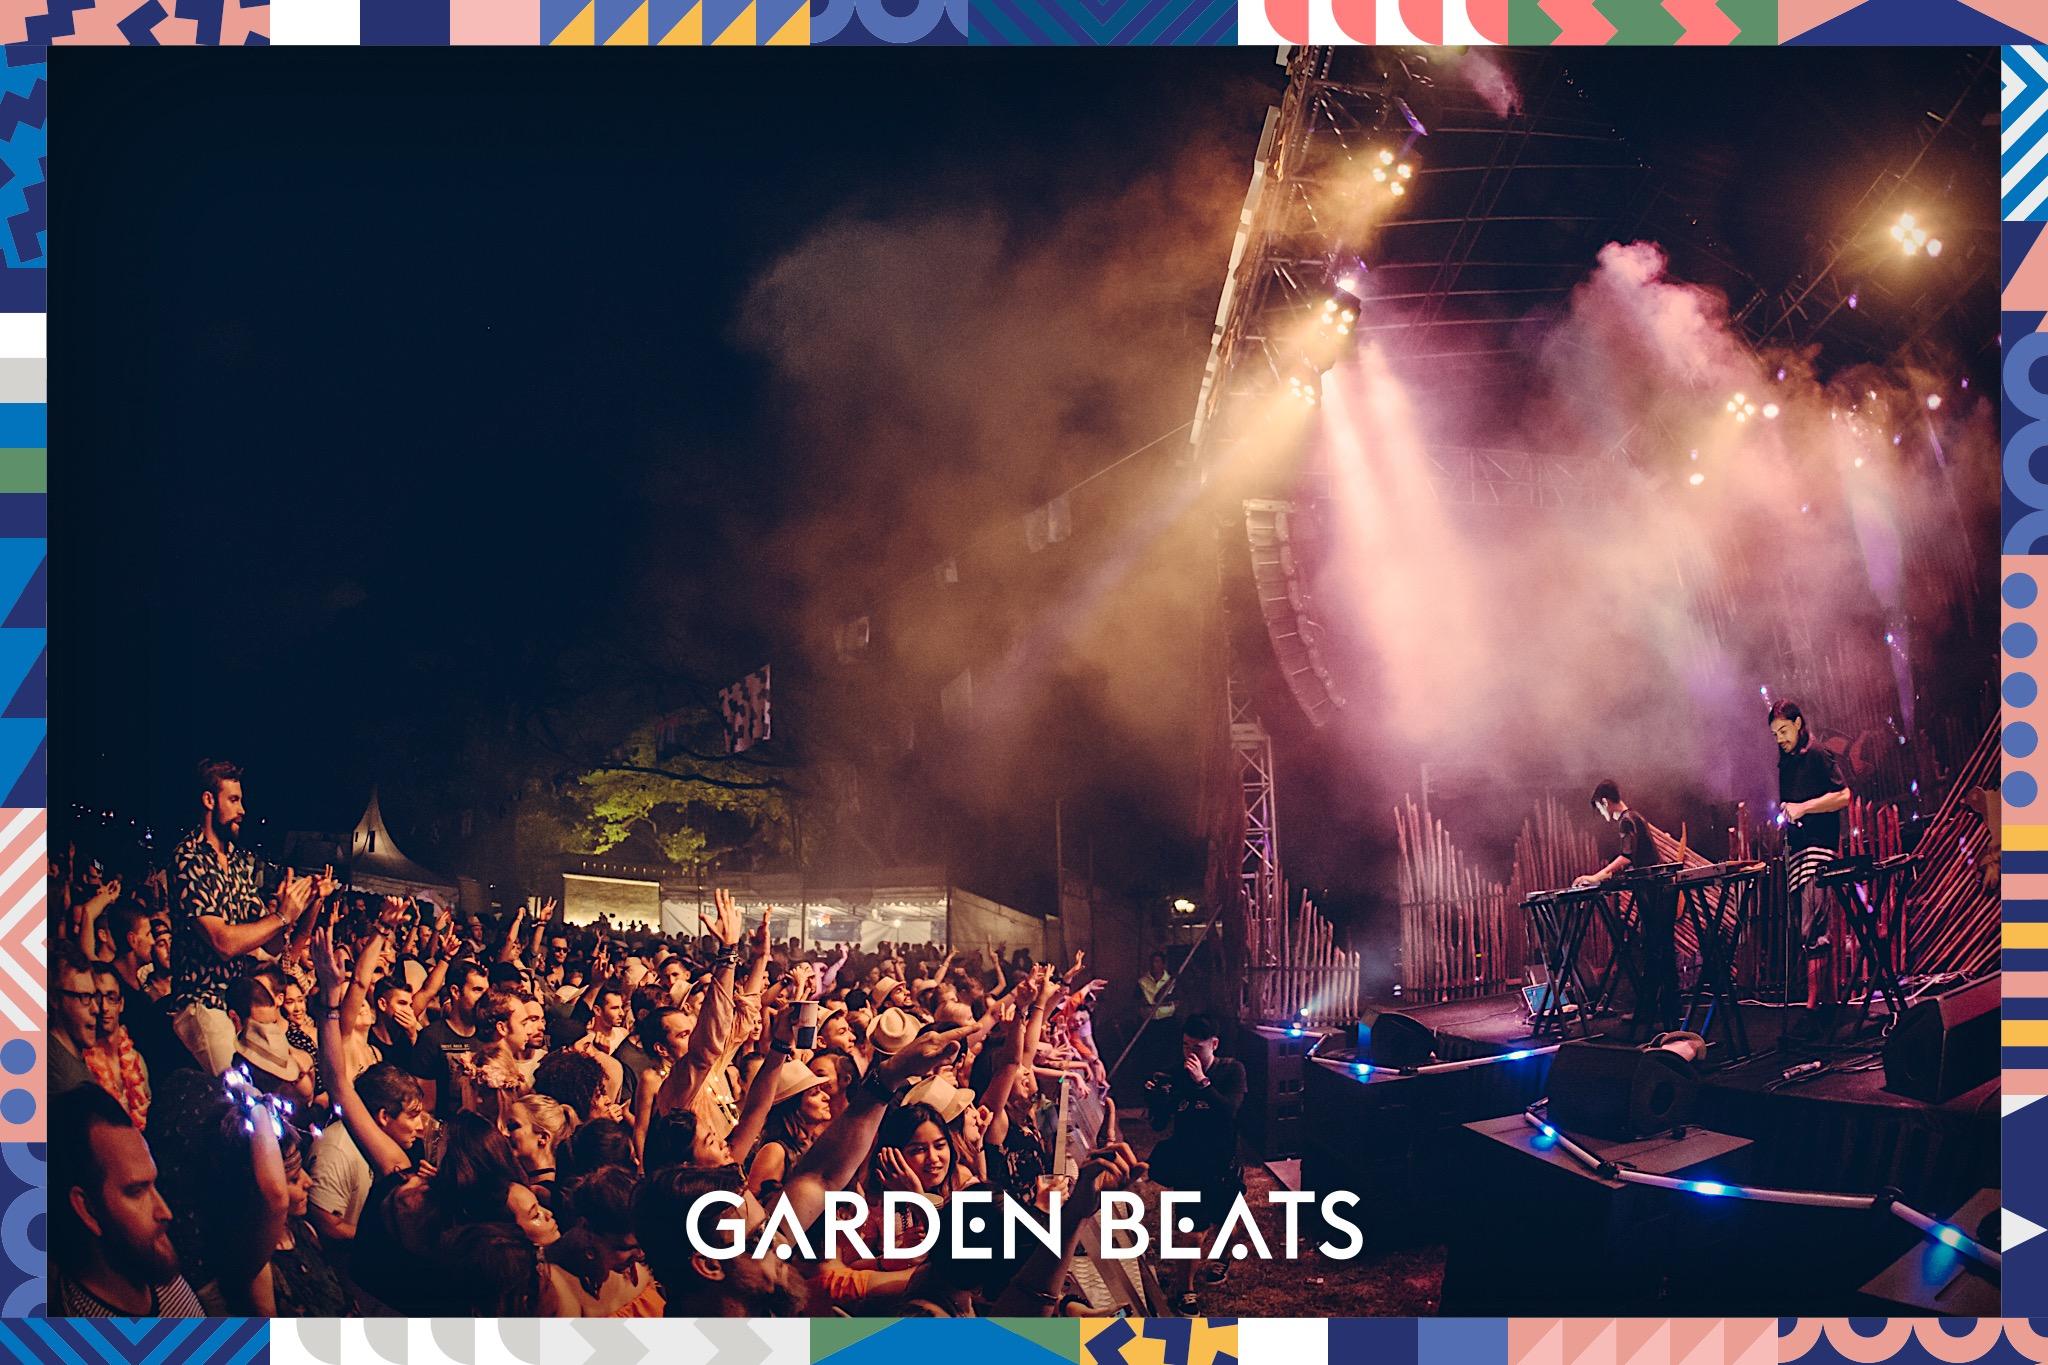 18032017_GardenBeats_Colossal822_WatermarkedGB.jpg